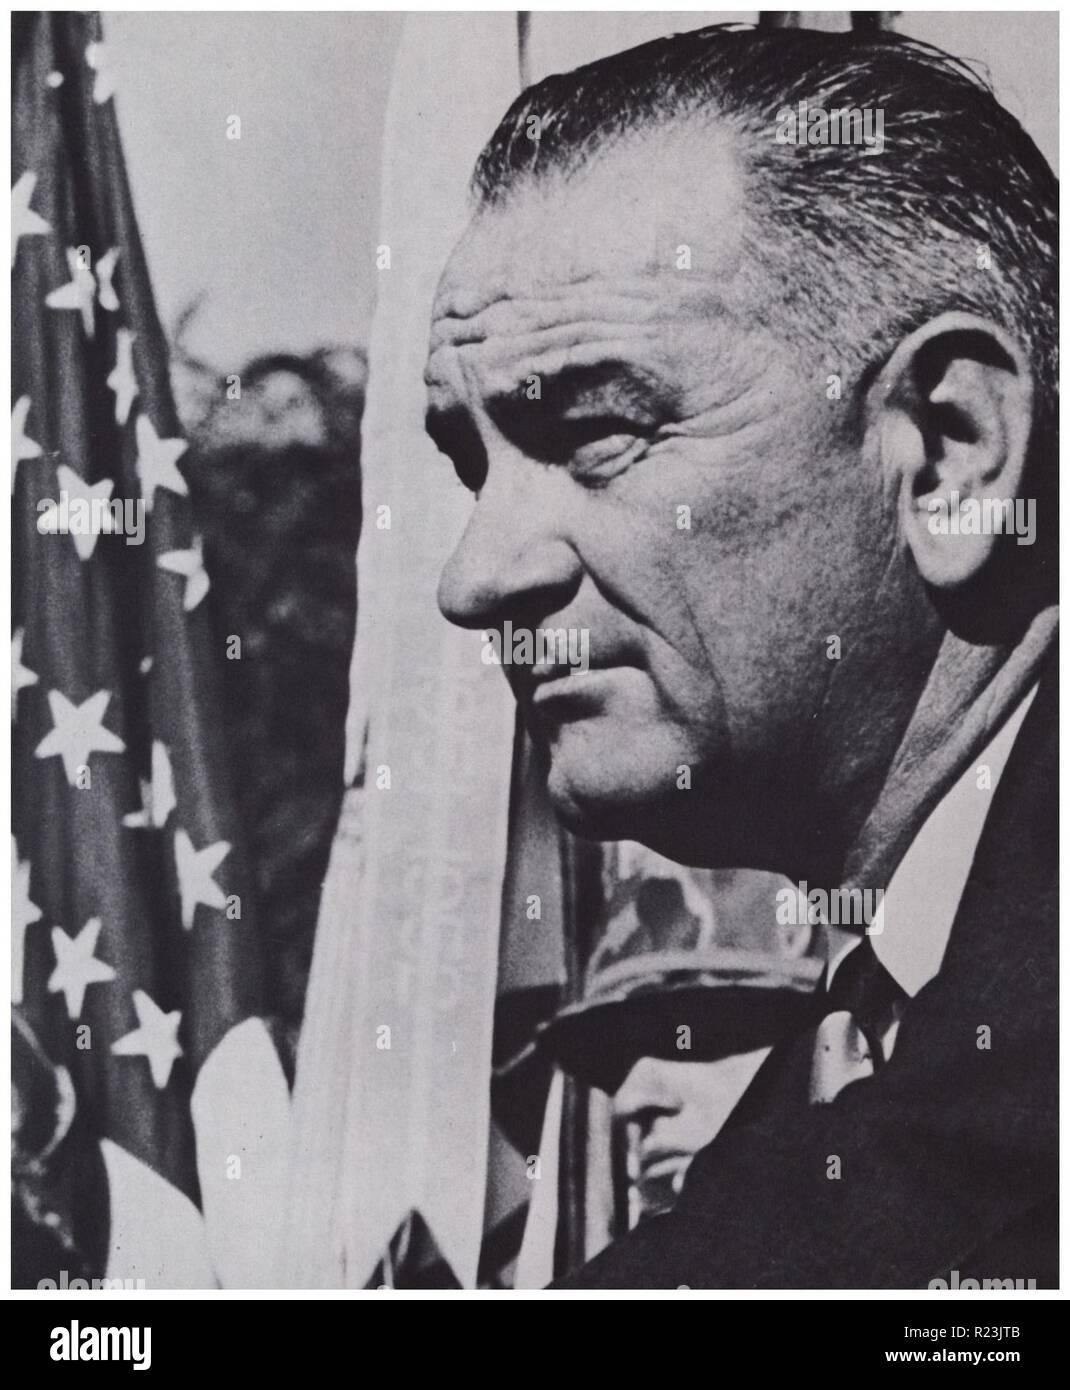 Lyndon Baines Johnson President of the USA 1963-1969 - Stock Image